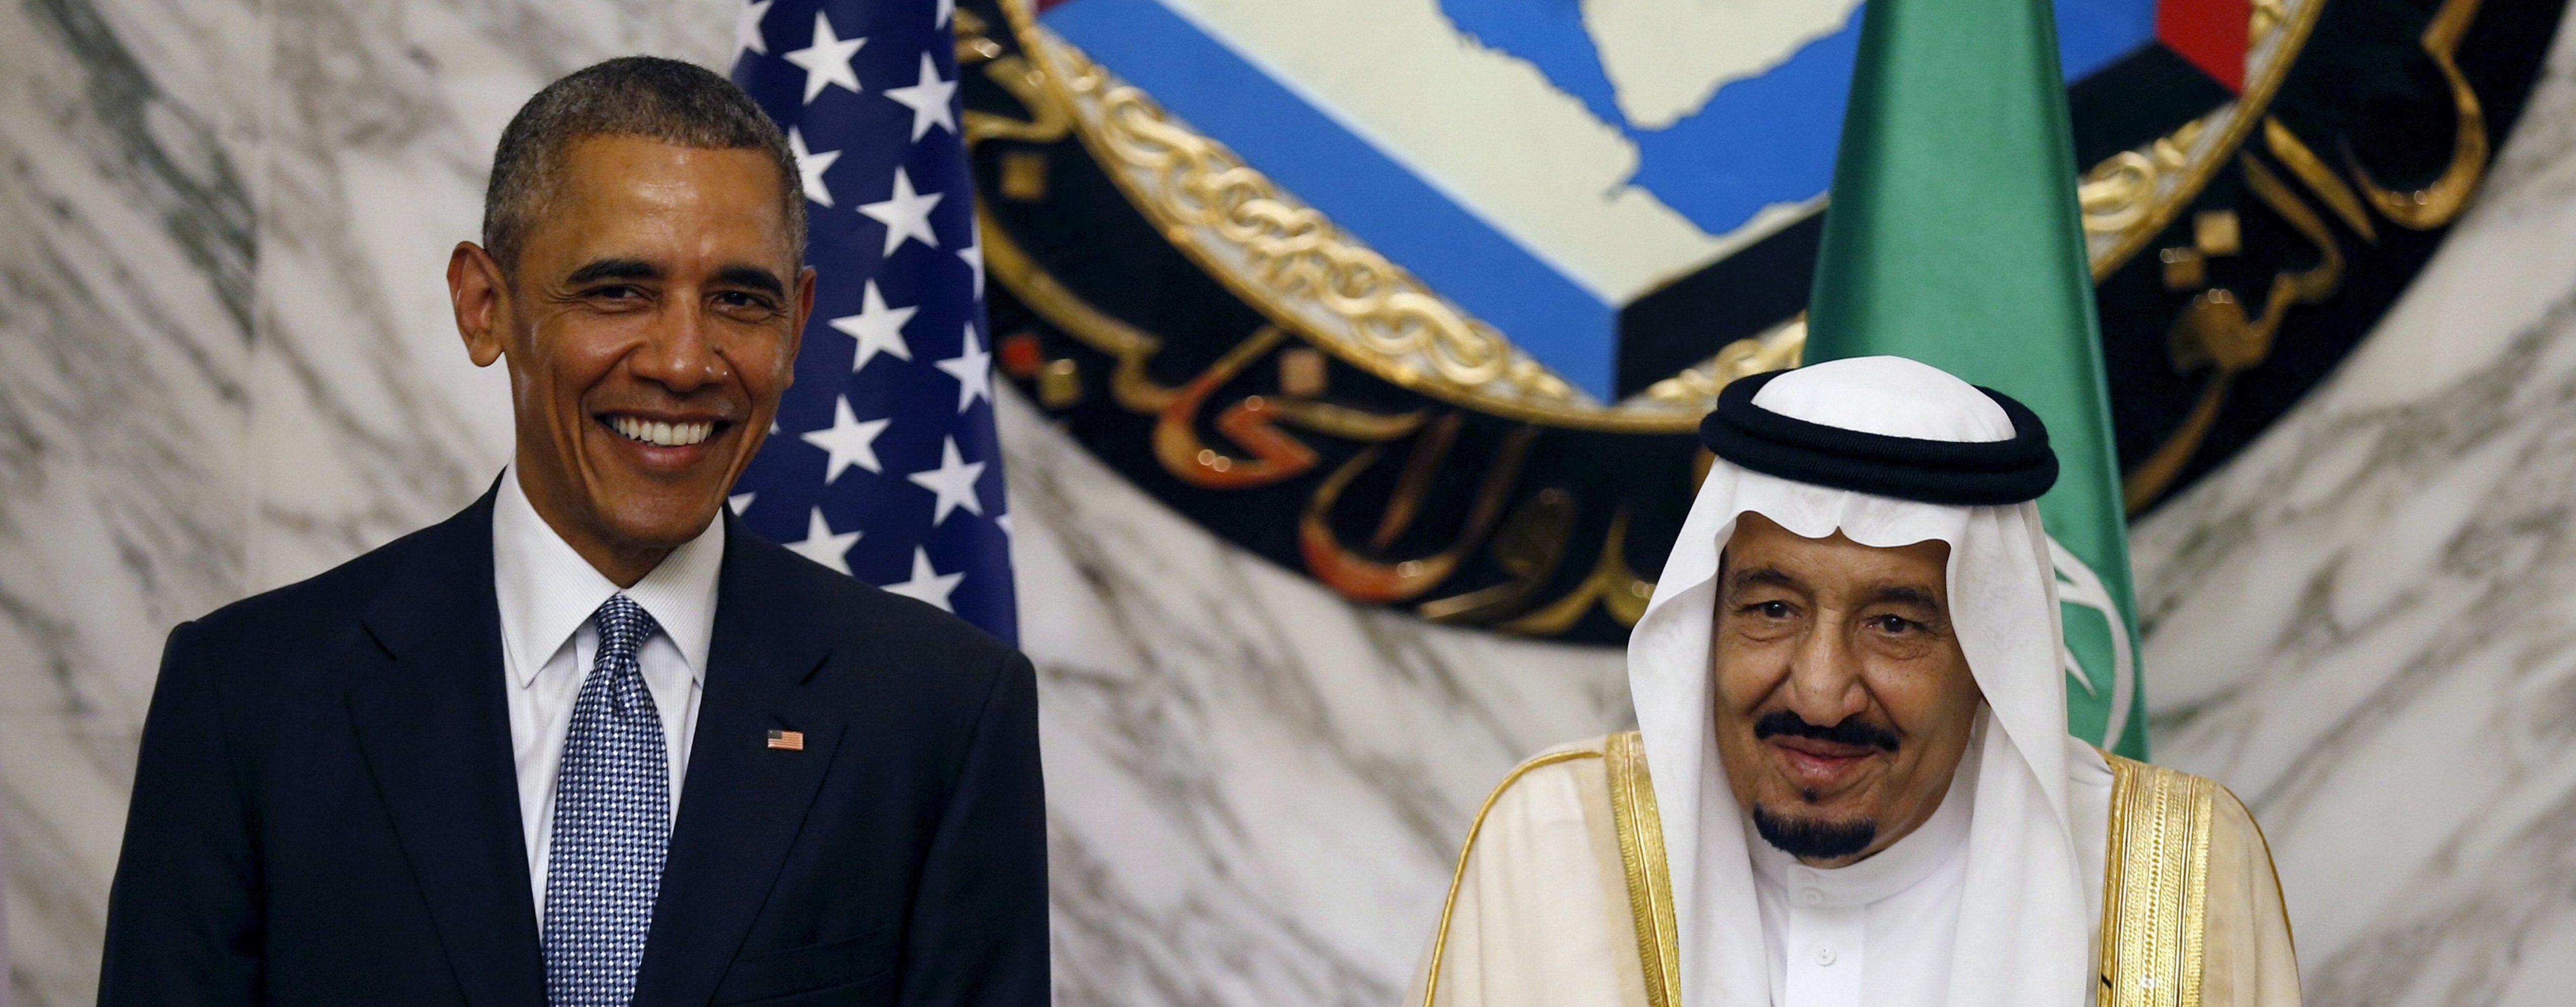 saudi arabia and terrorism pdf